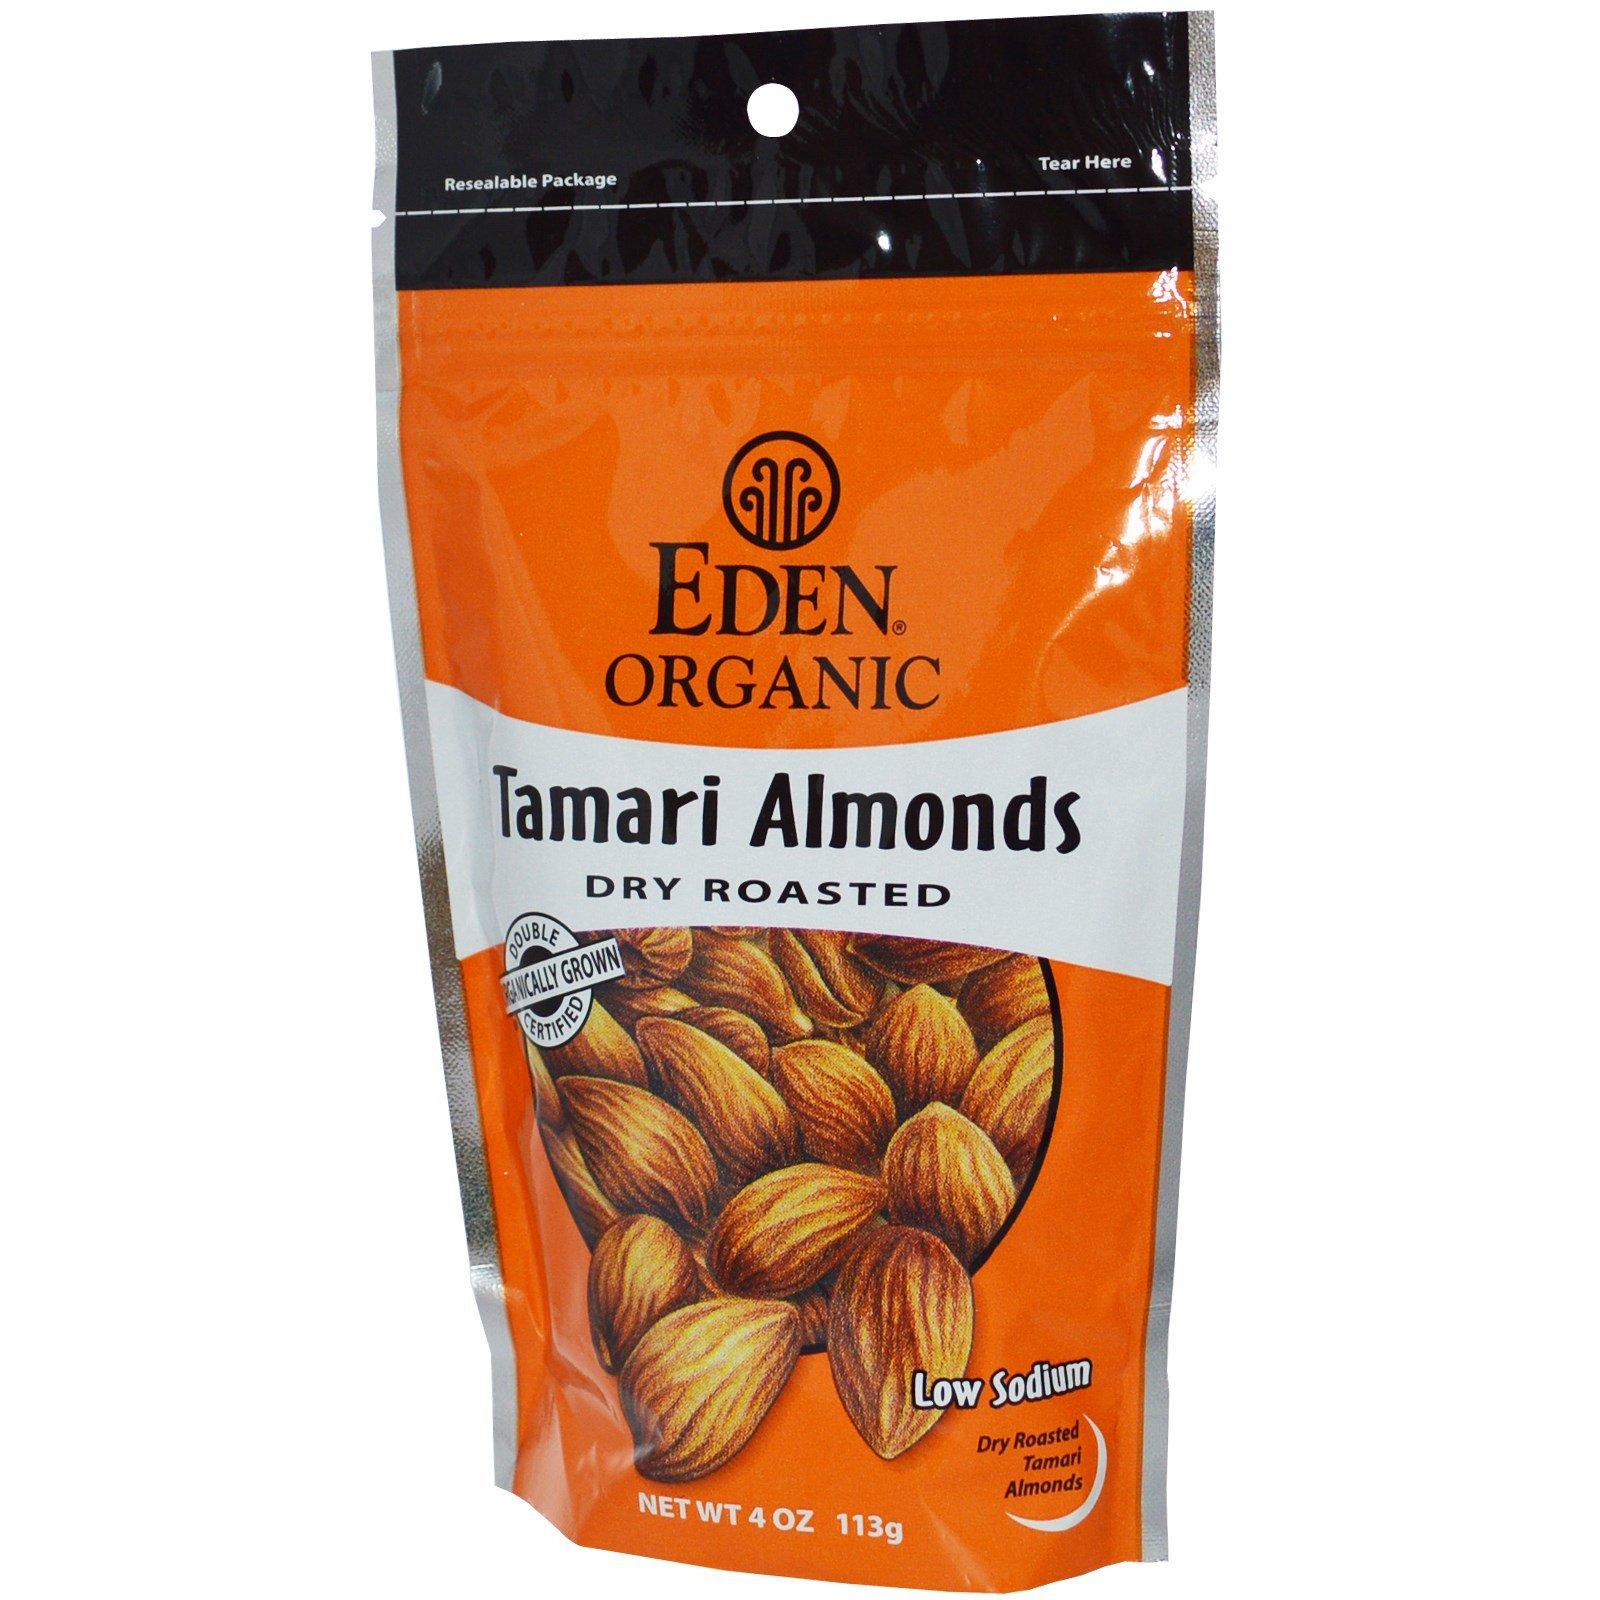 Tamari Almonds Eden Organic 4 oz Bag